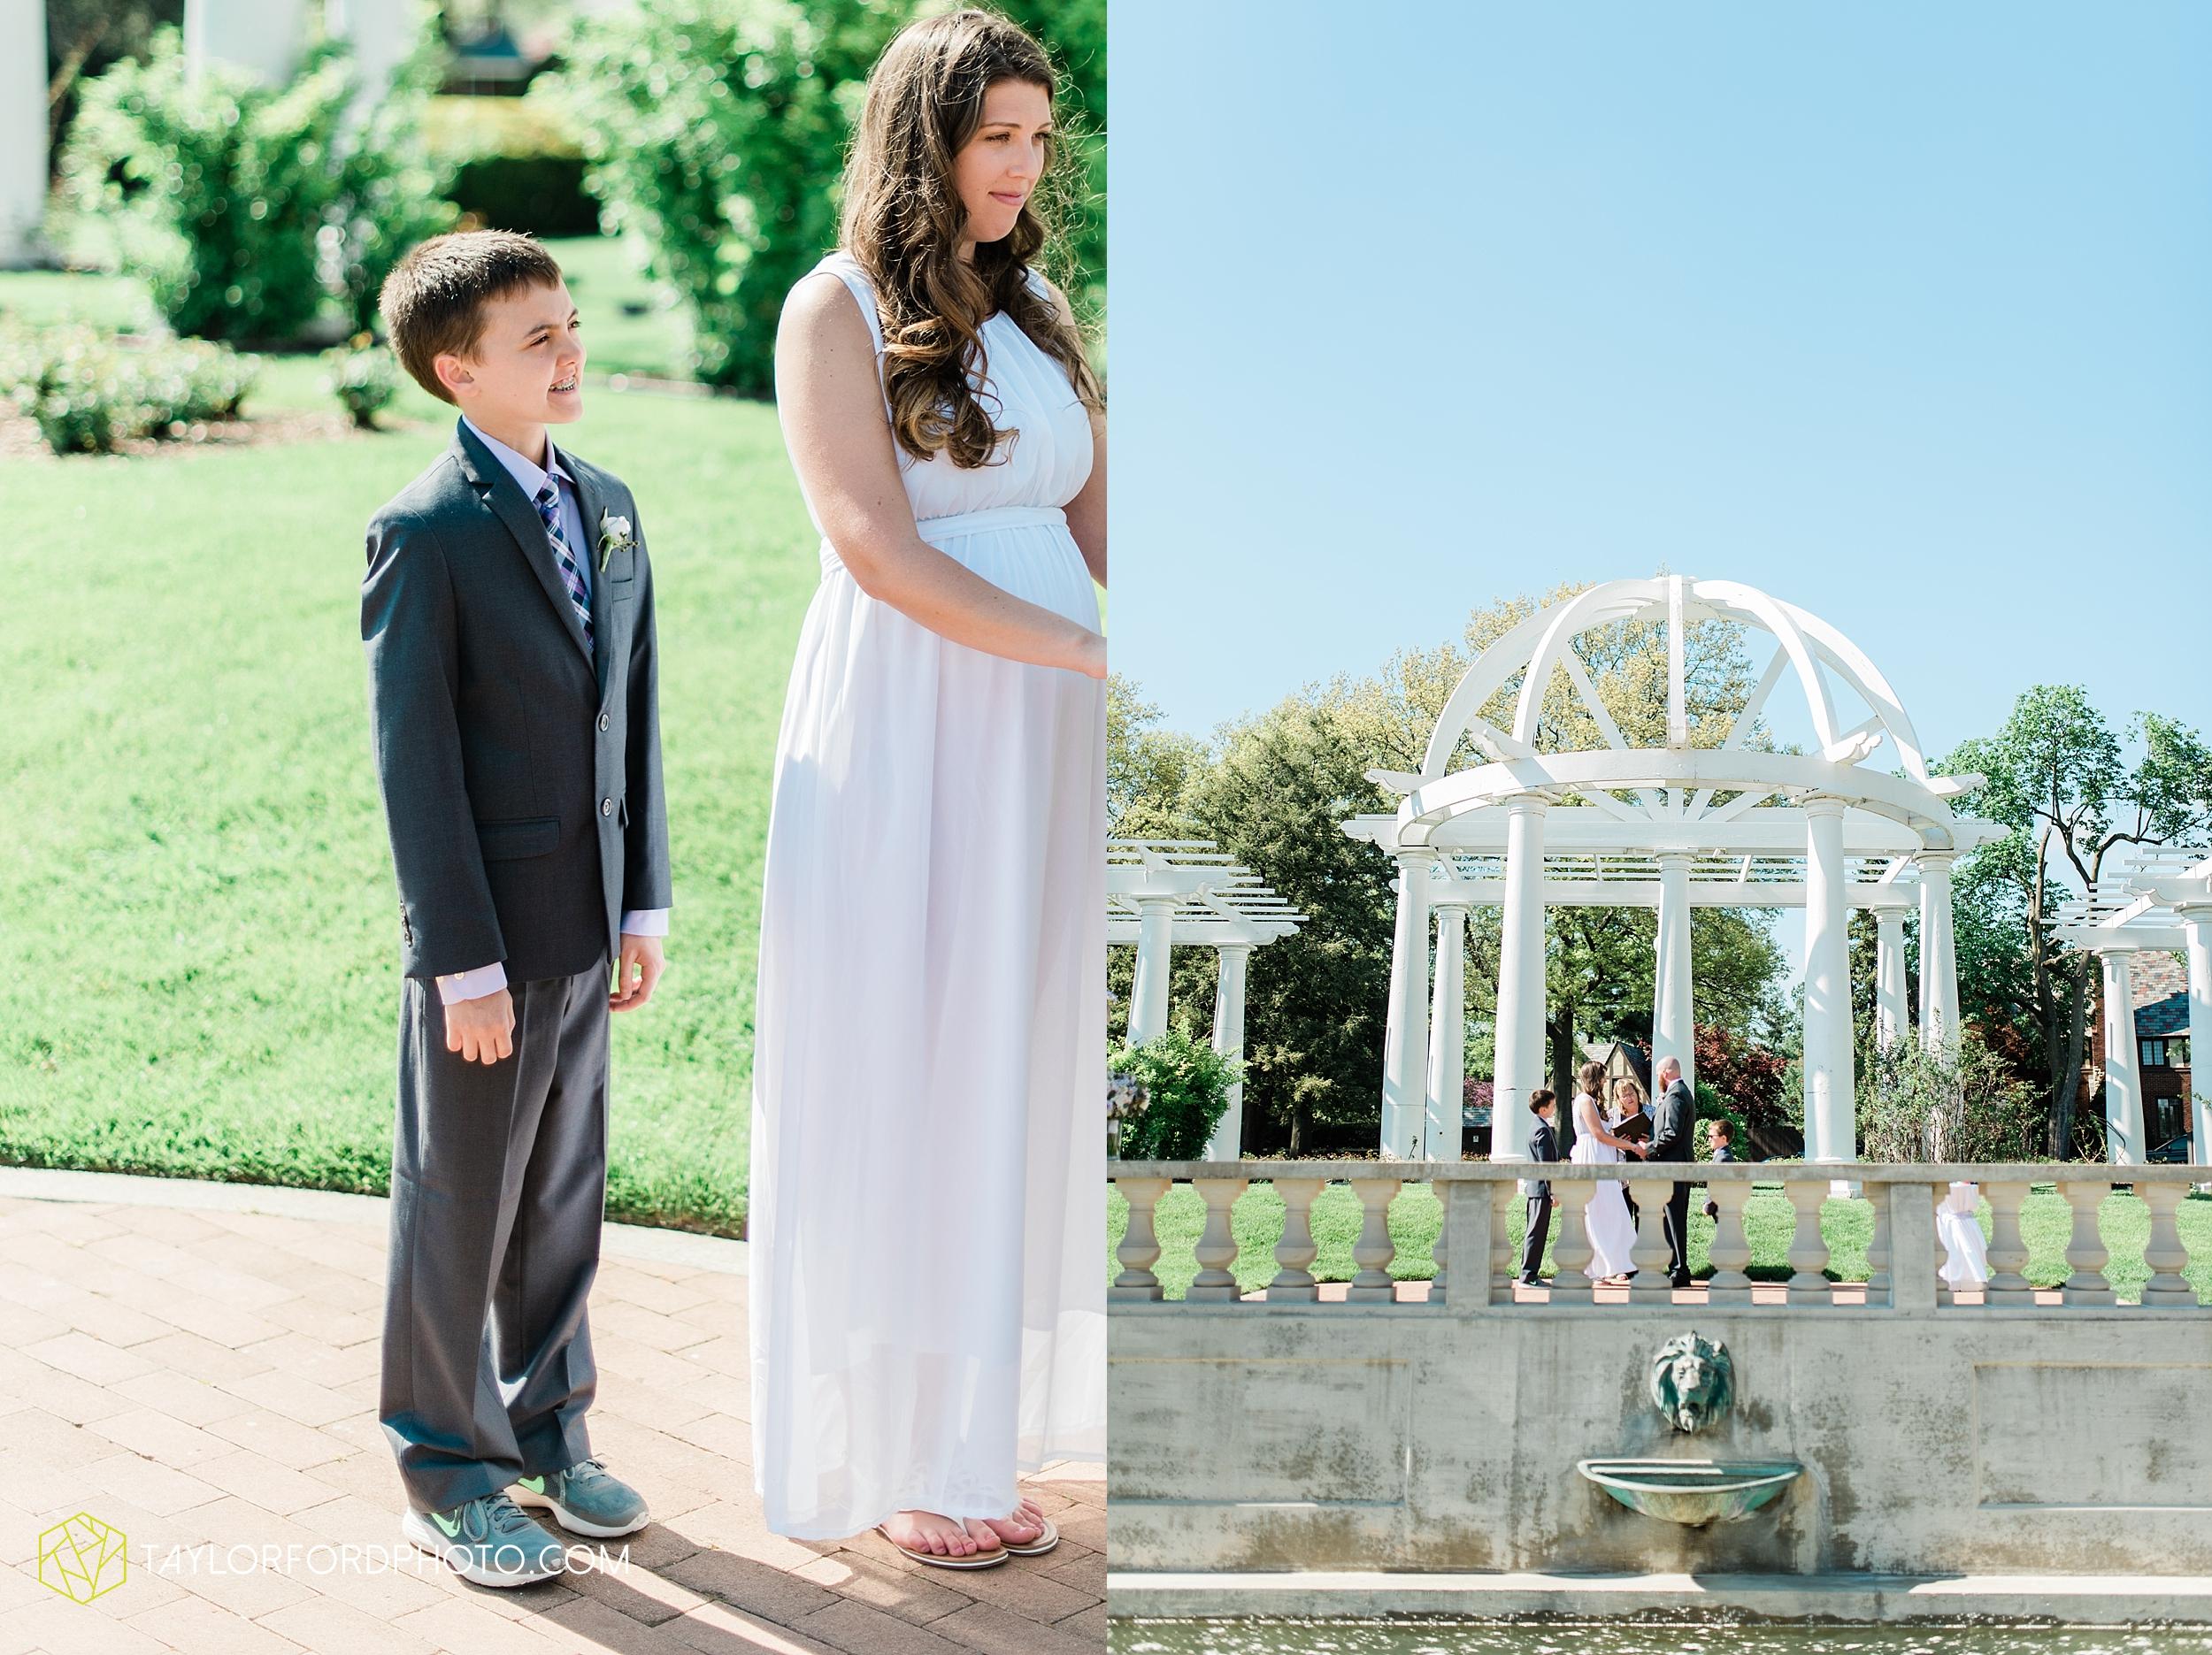 lakeside-rose-gardens-fort-wayne-indiana-elopement-wedding-photographer-Taylor-Ford-Photography_7144.jpg